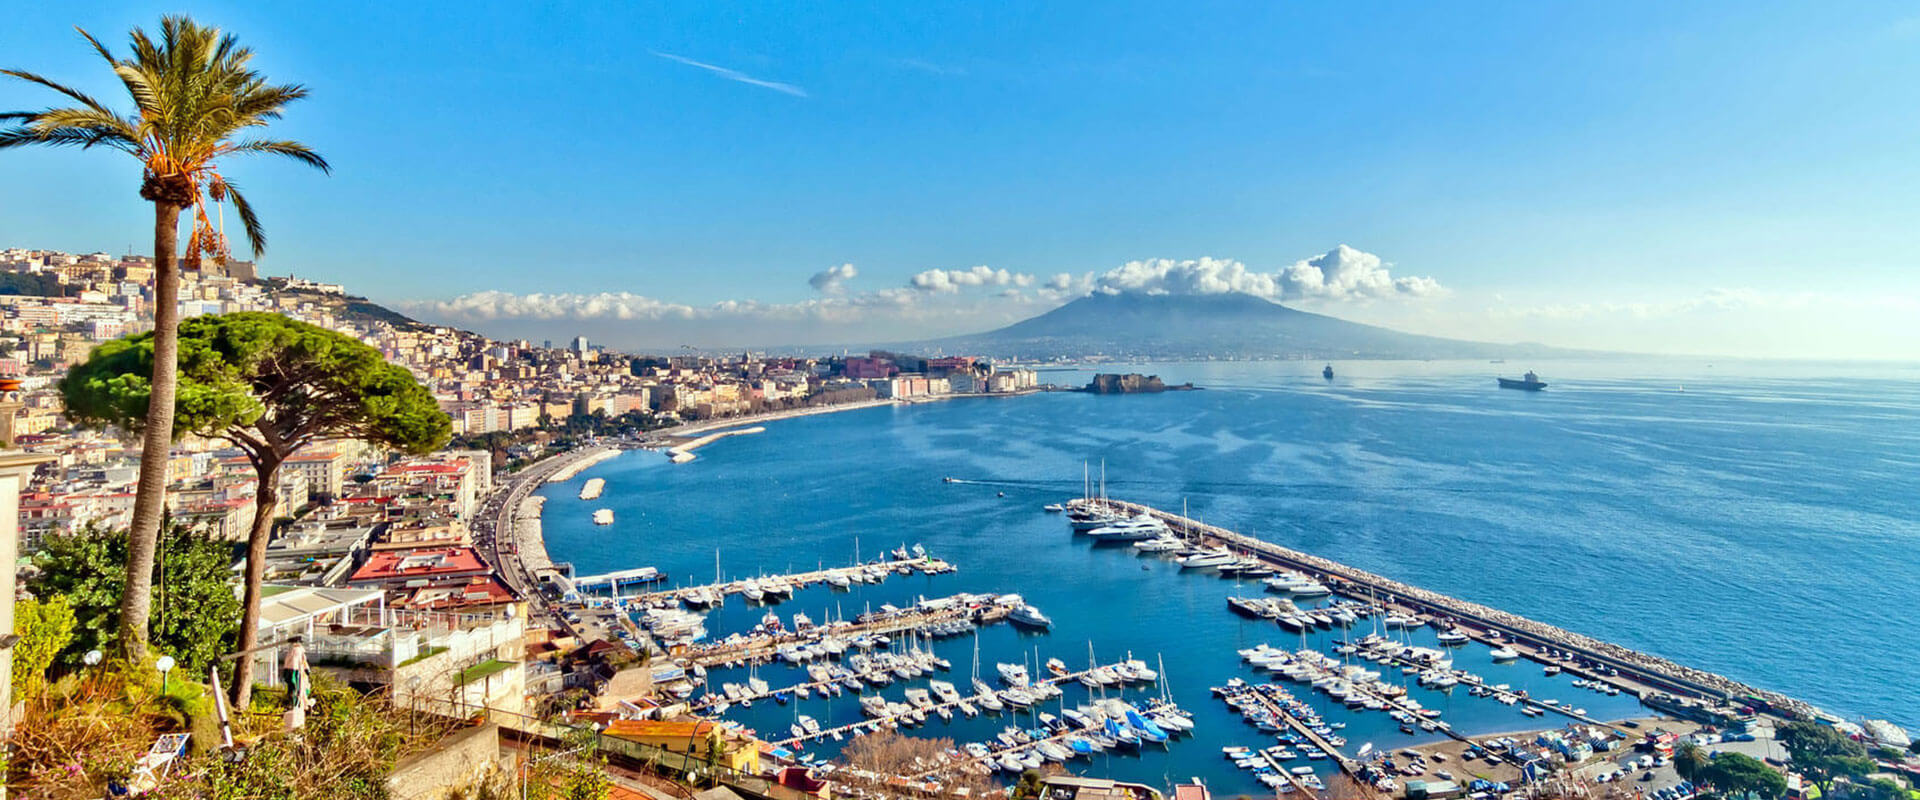 Naples-Pompei-Sorrento-Capri-cover